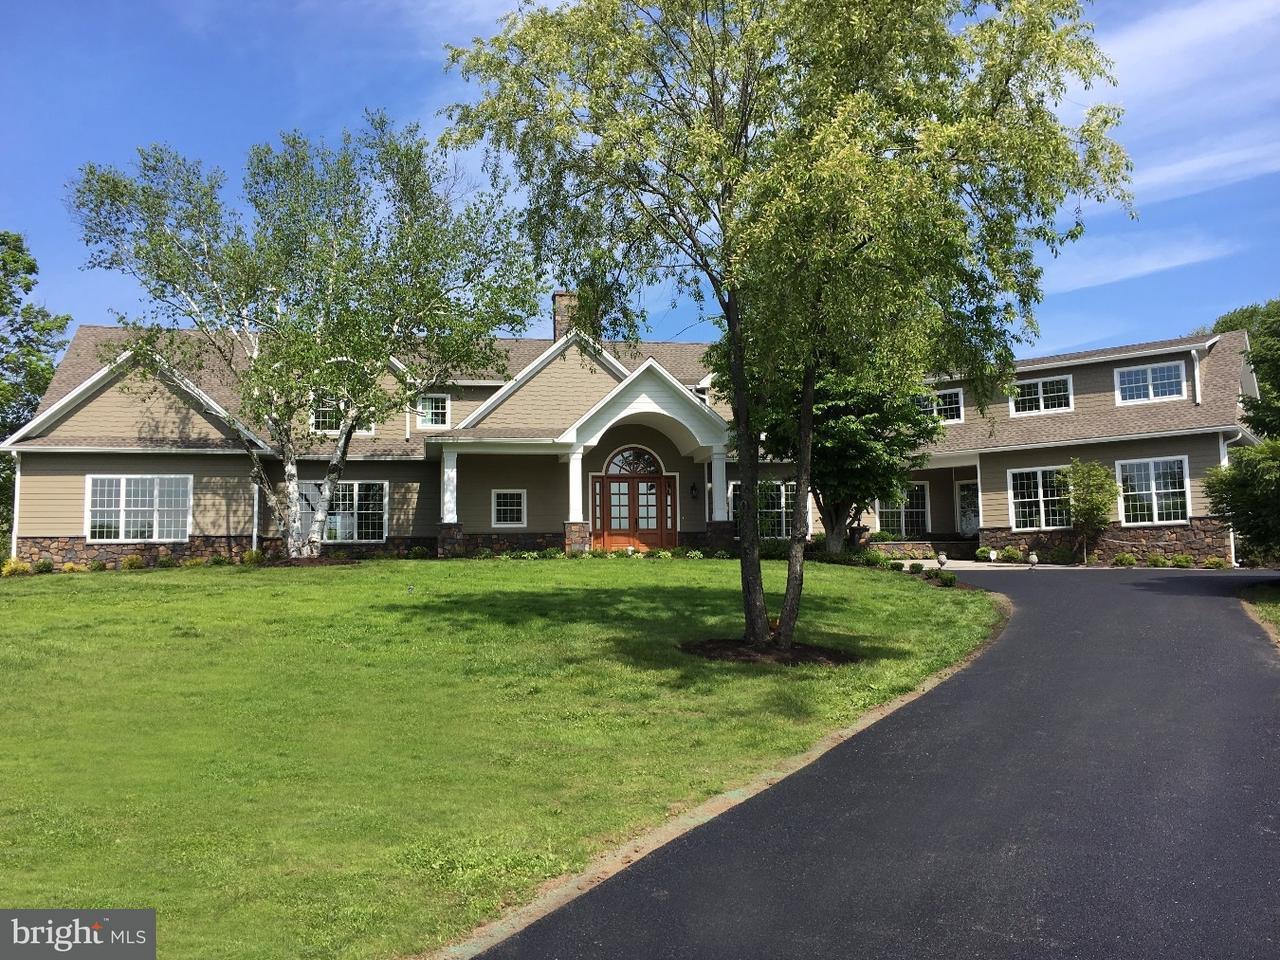 Single Family Home for Sale at 2061 LENAPE UNIONVILLE Road Kennett Square, Pennsylvania 19348 United States